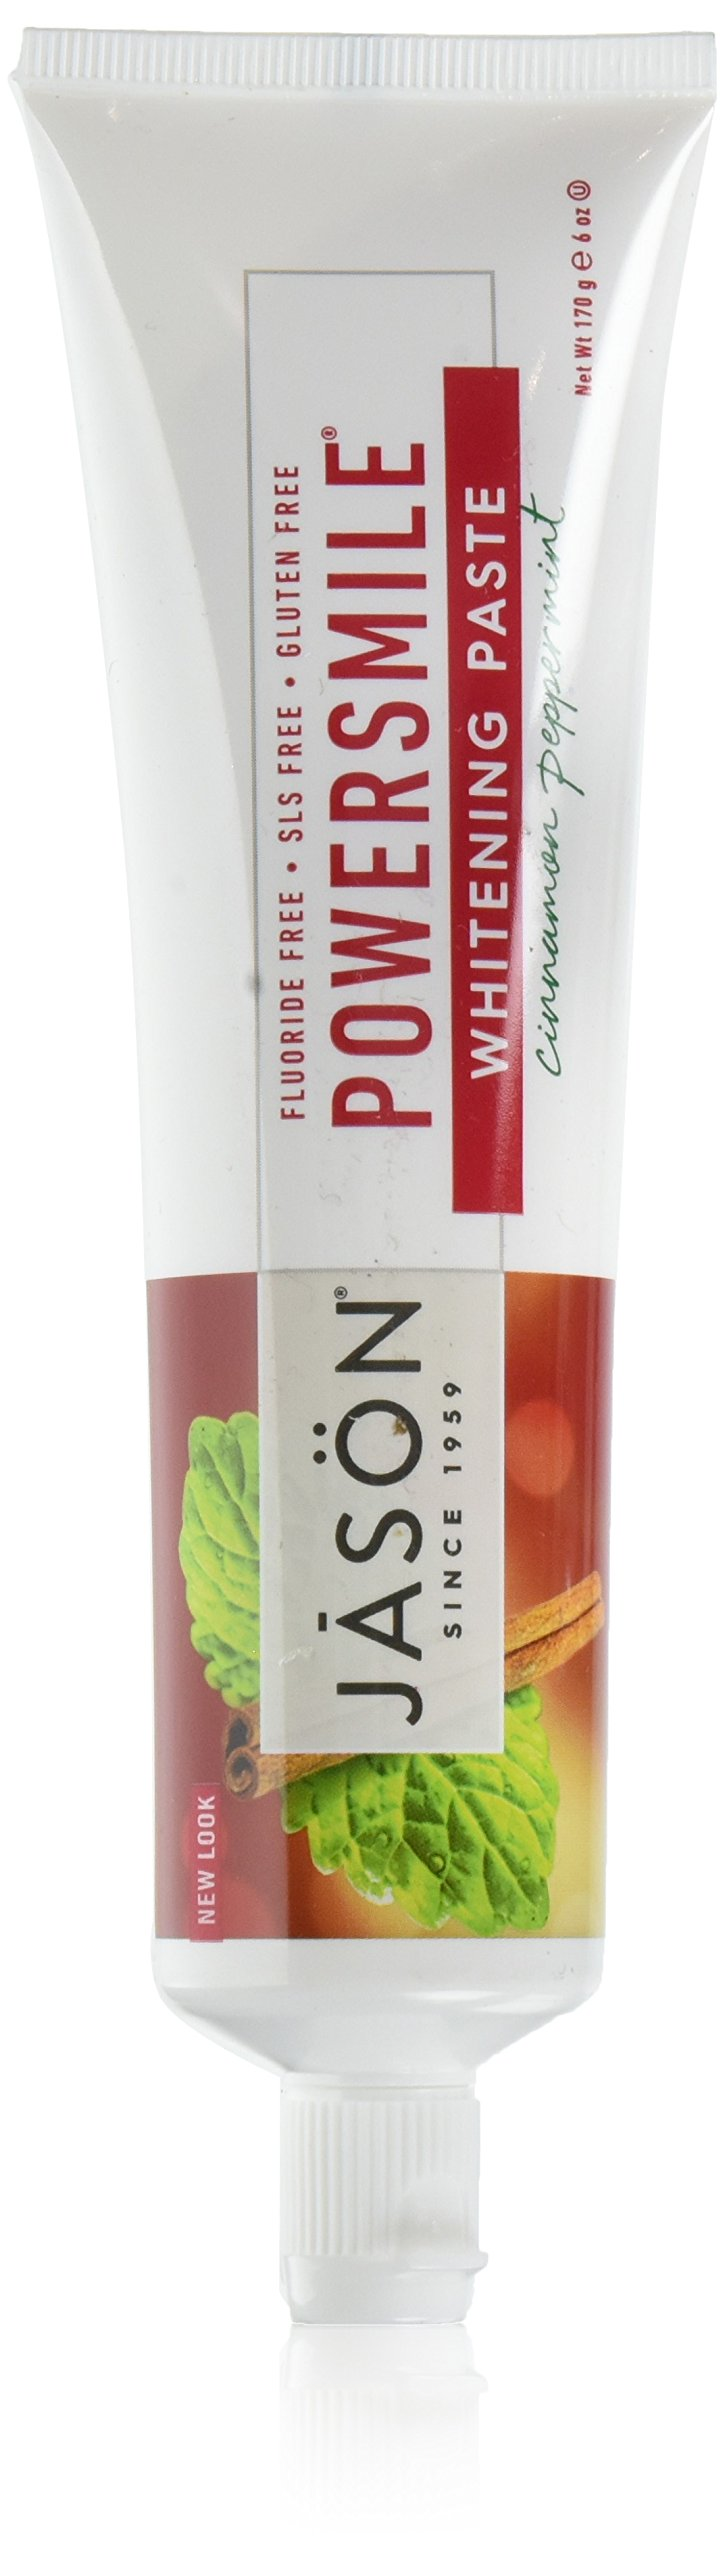 JASON Powersmile Toothpaste, Cinnamon Peppermint, 6 Ounce